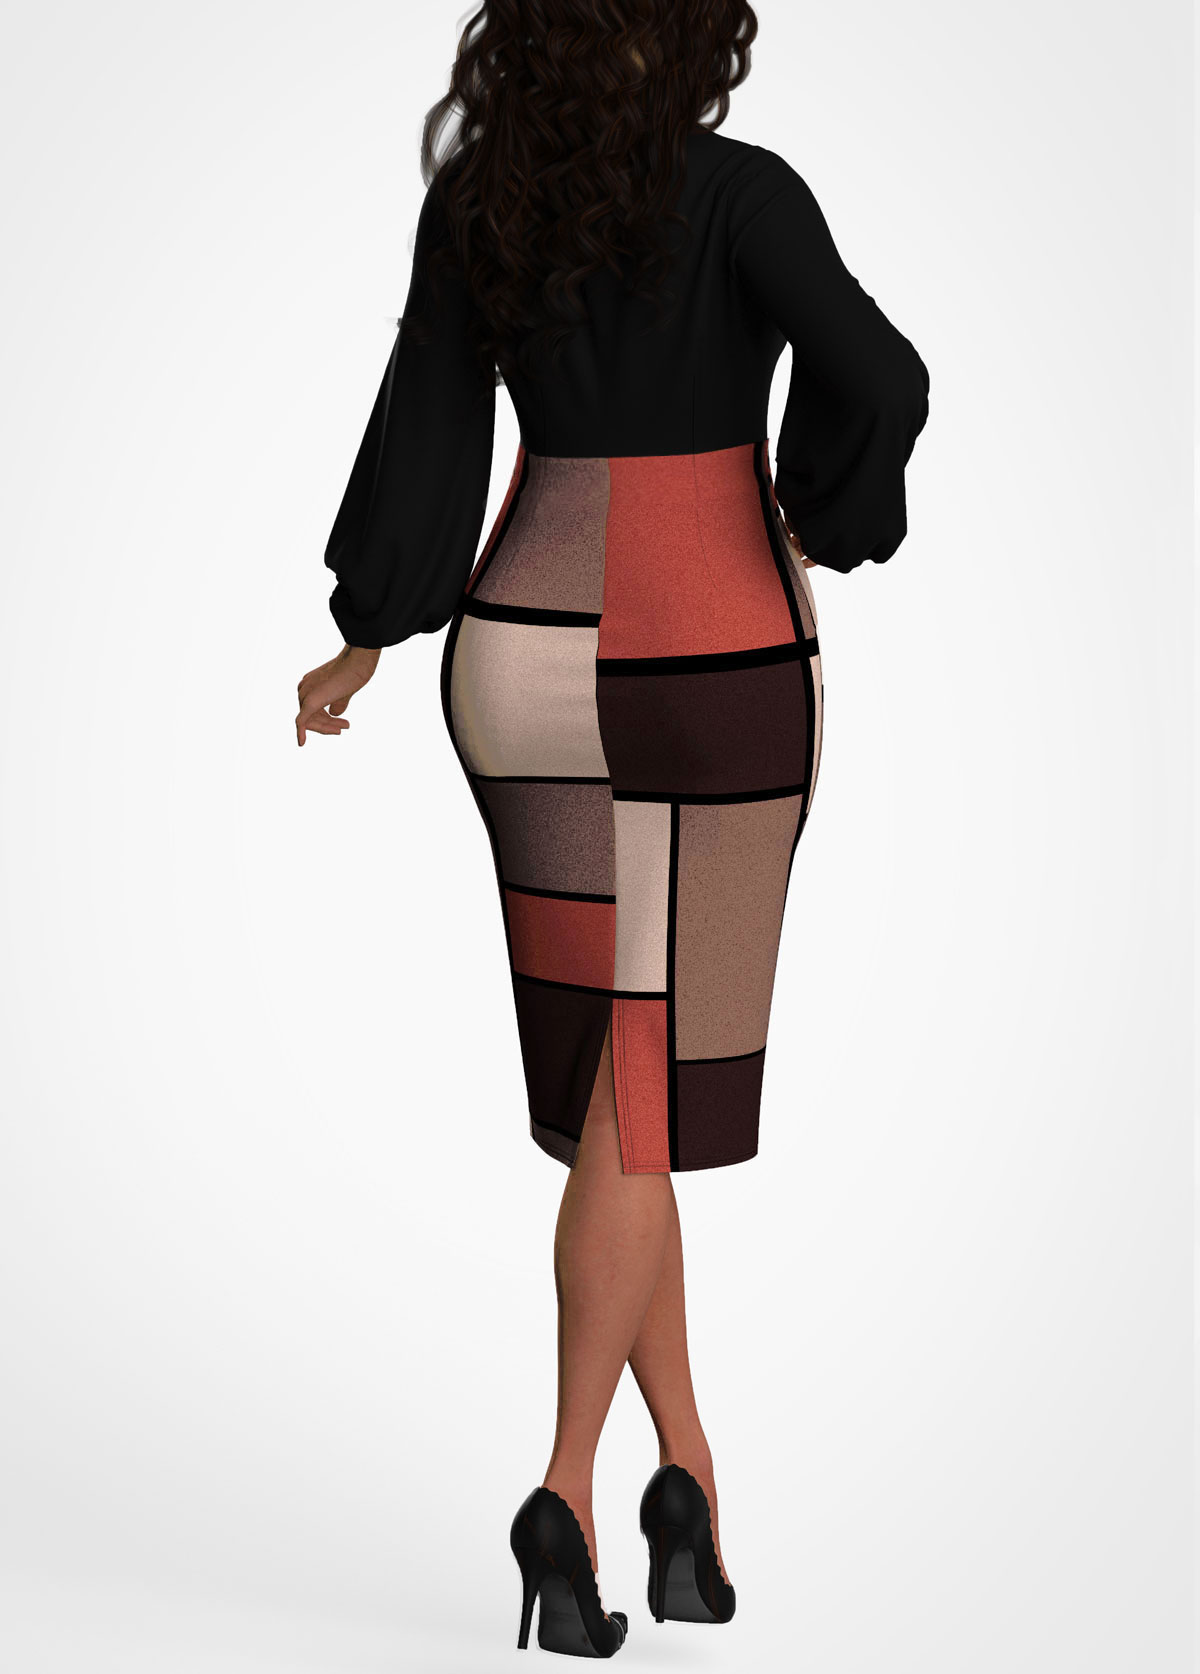 Keyhole Neckline Geometric Print Lantern Sleeve Dress